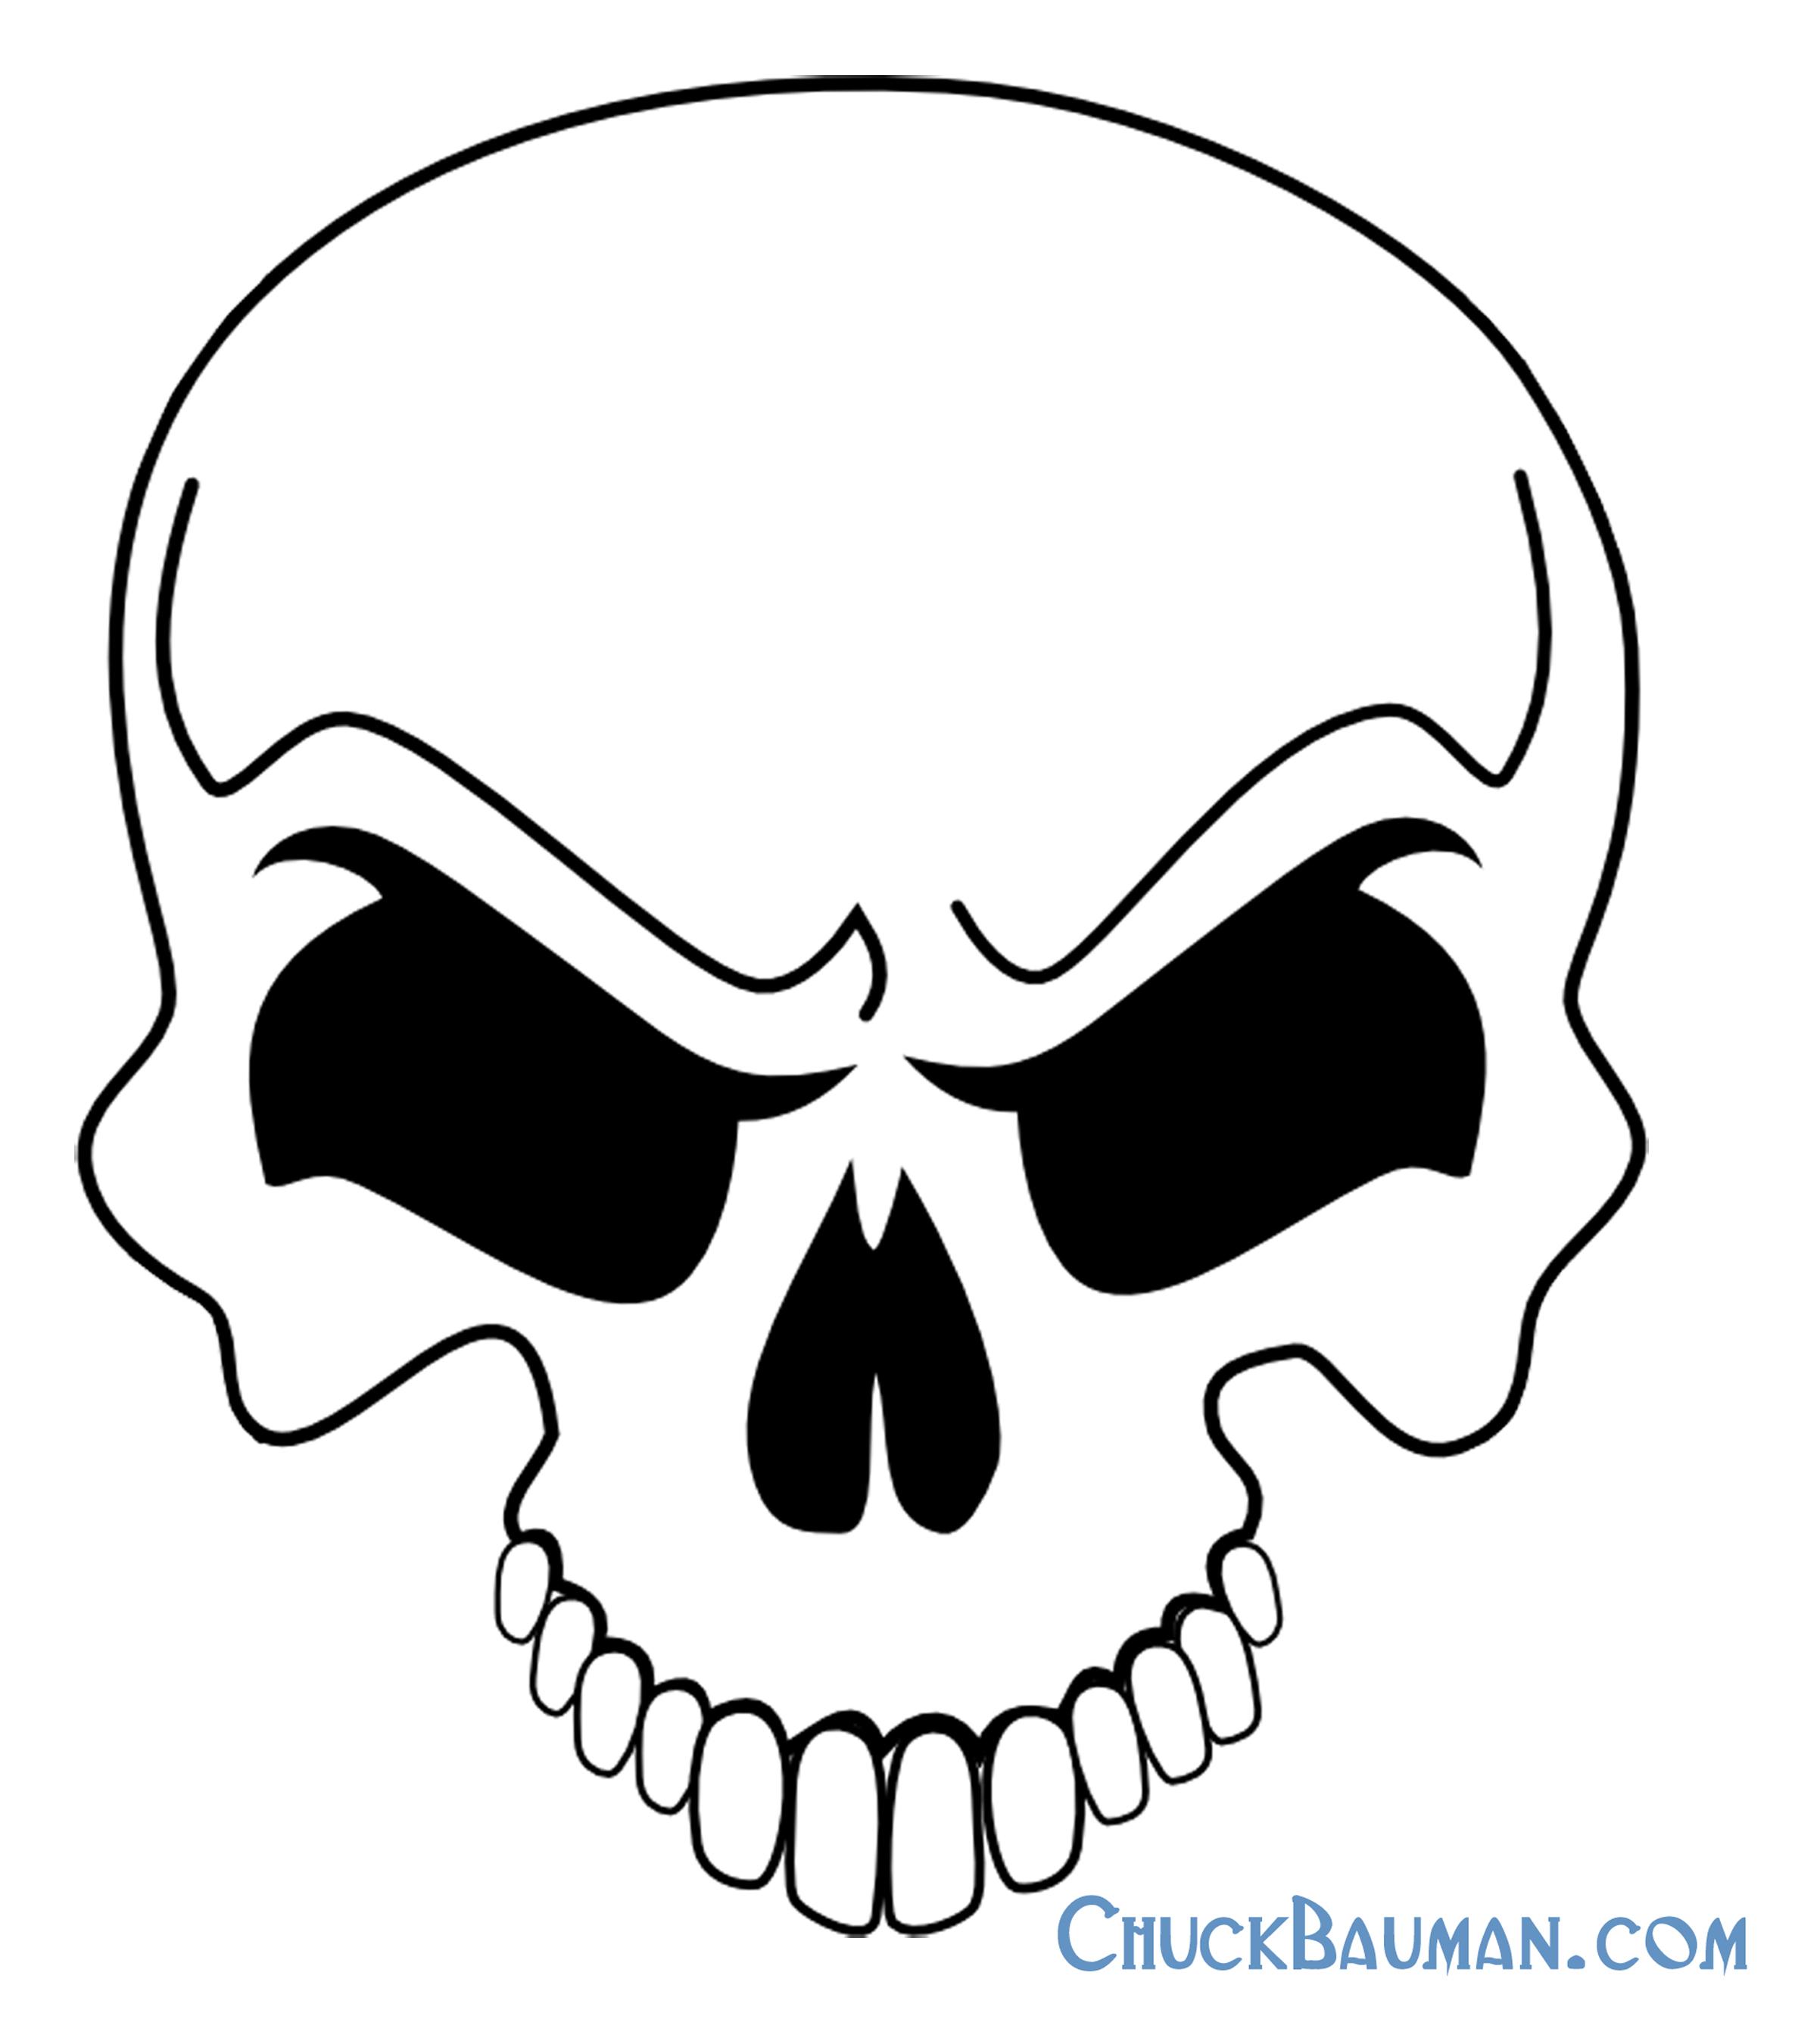 Skulls Airbrushing - Free Skull Airbrushing Stencils - Free - Free Printable Airbrush Stencils